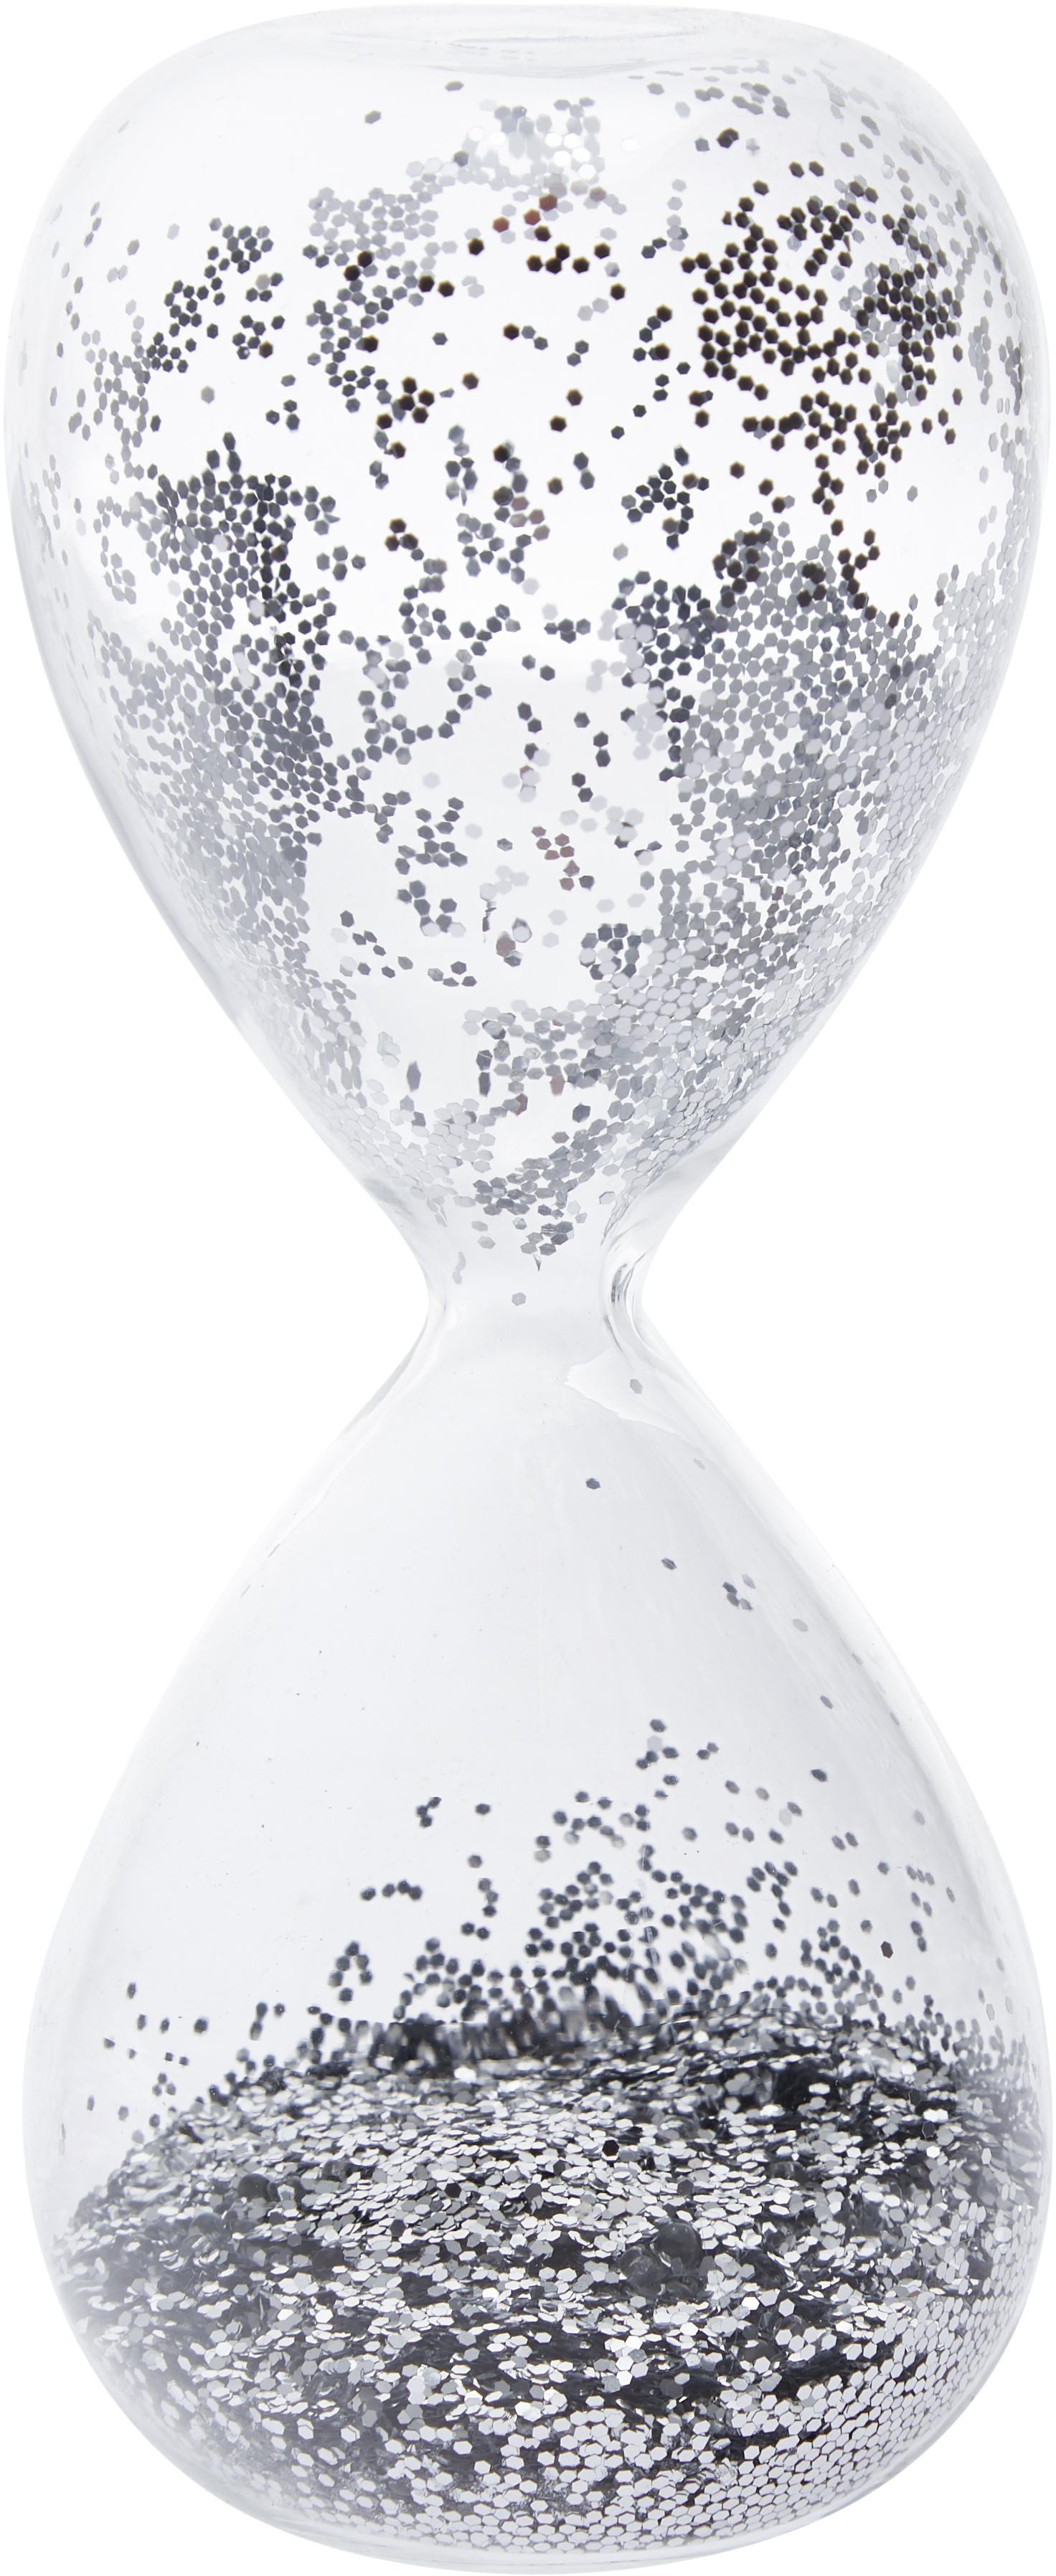 Decoratief object Hourglass, Transparant, zilverkleurig, Ø 7 x H 16 cm